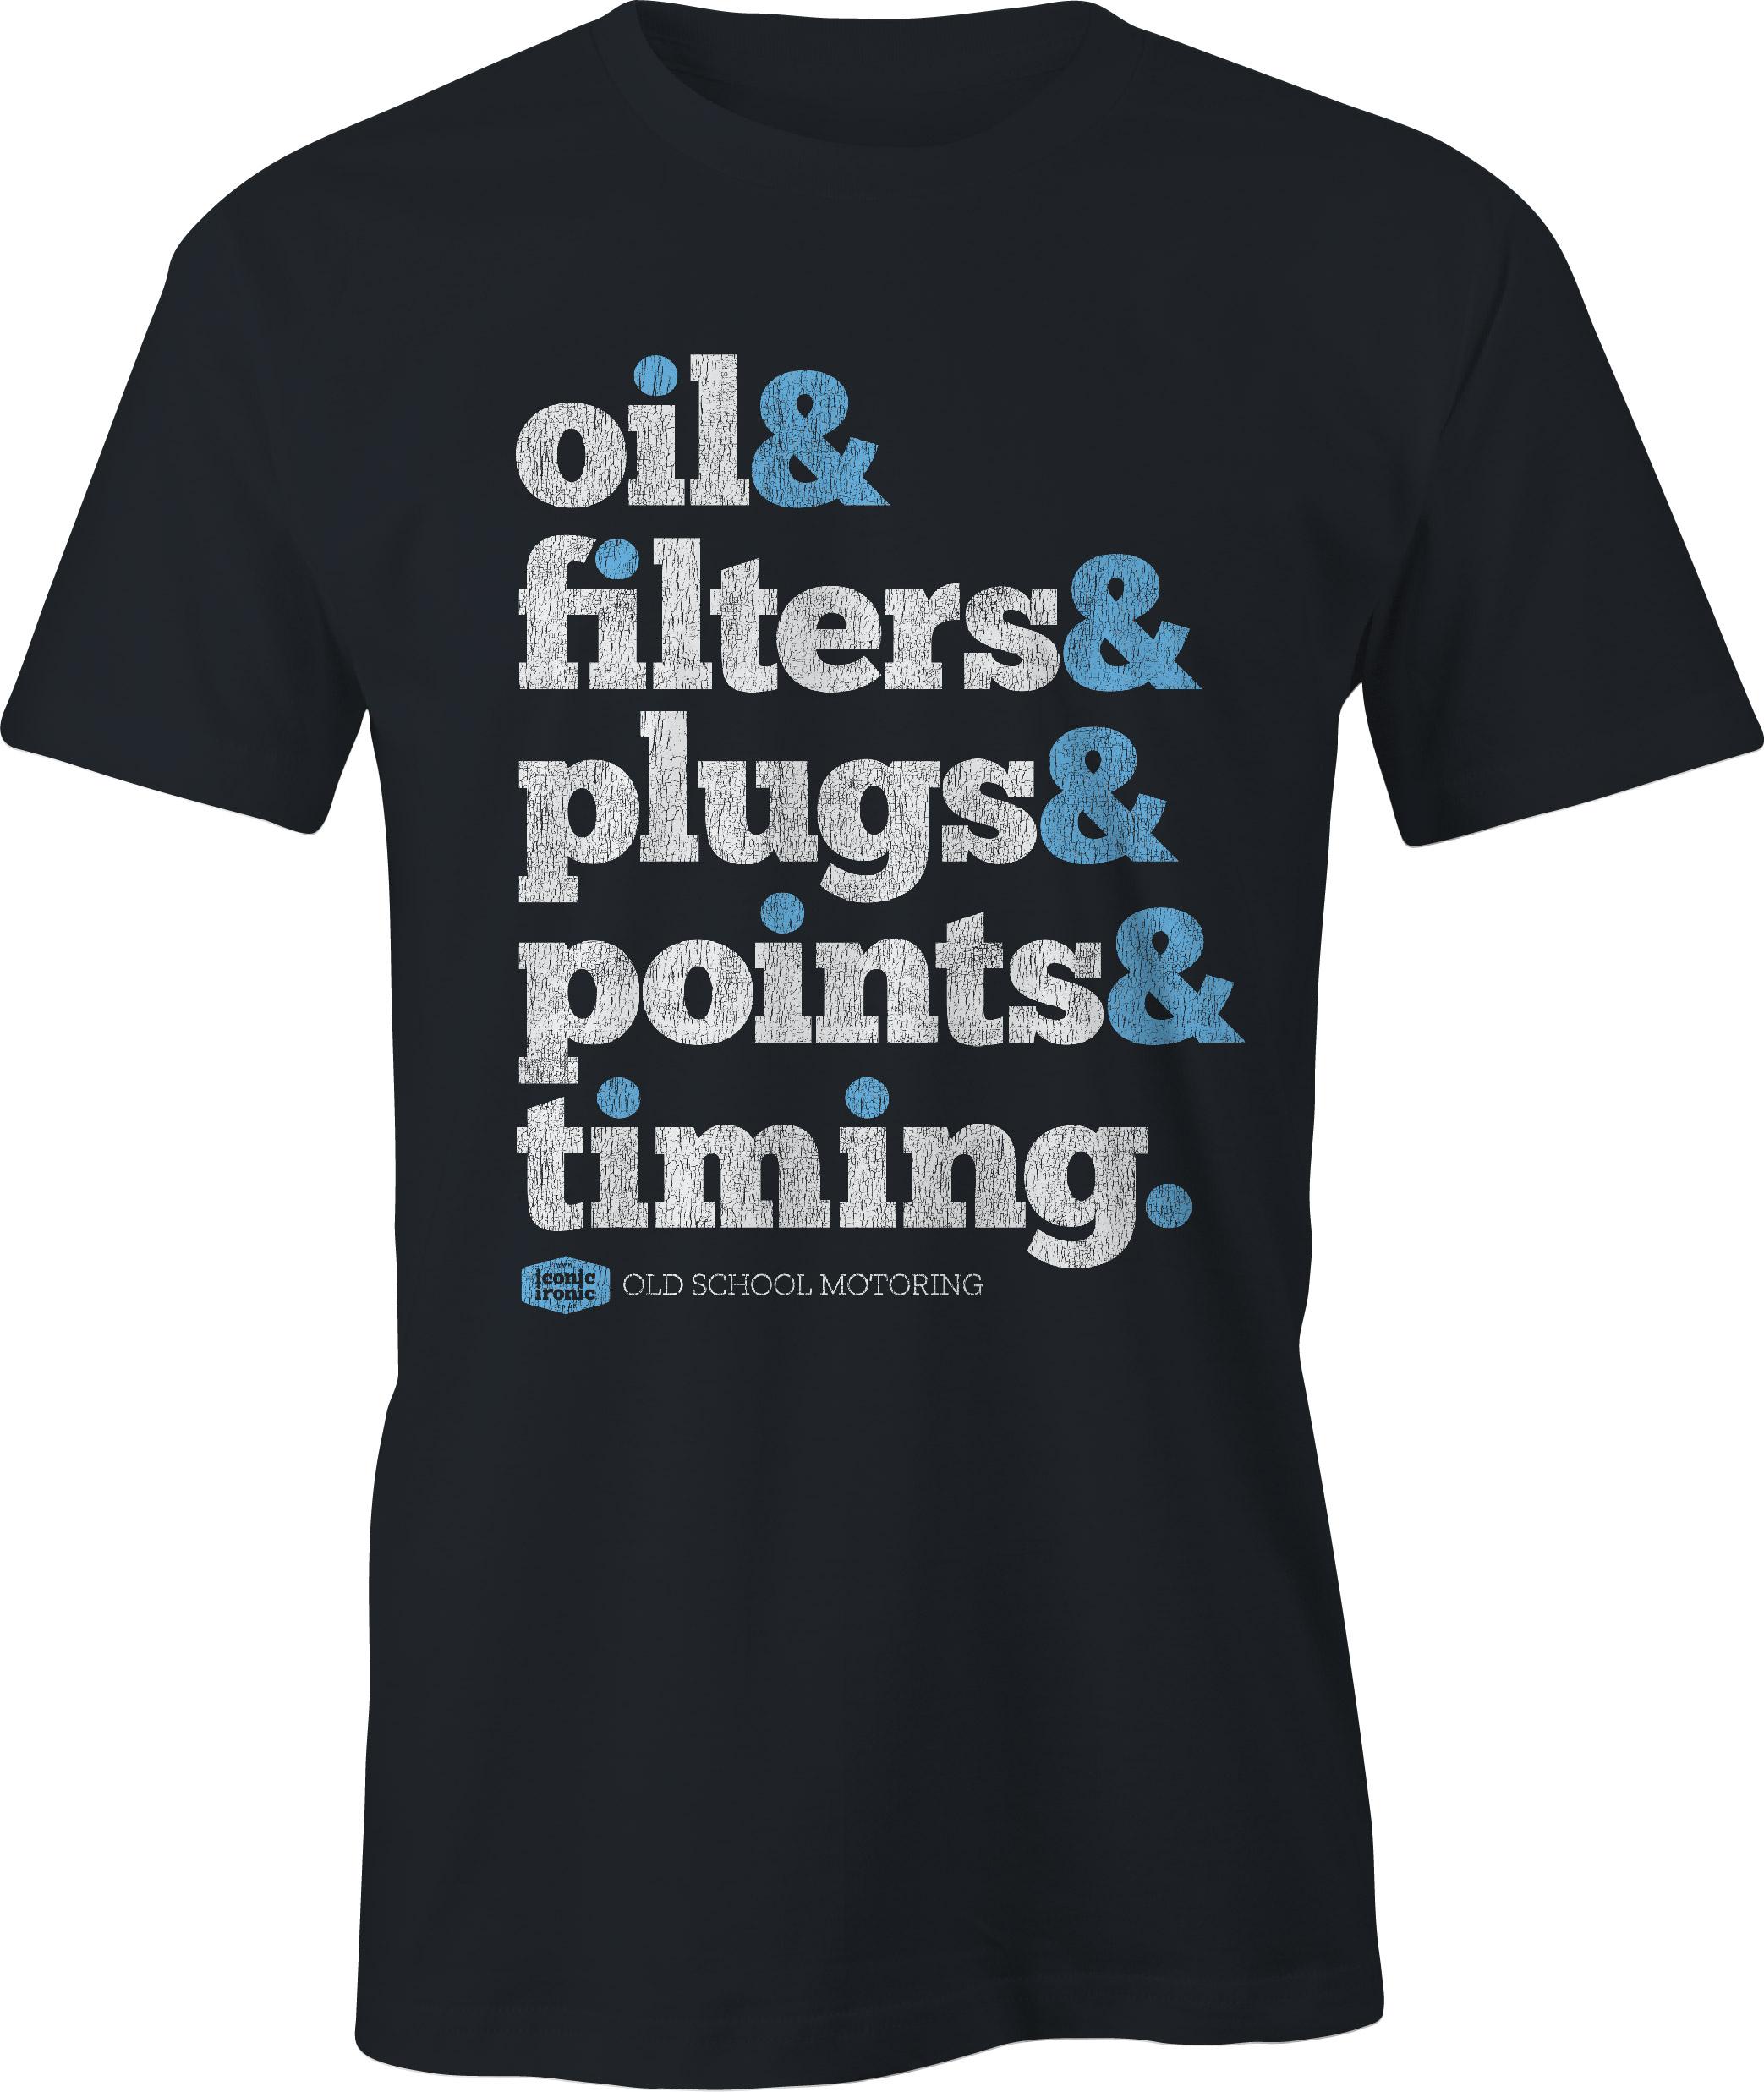 Oil & Filters Wording Black T Shirt